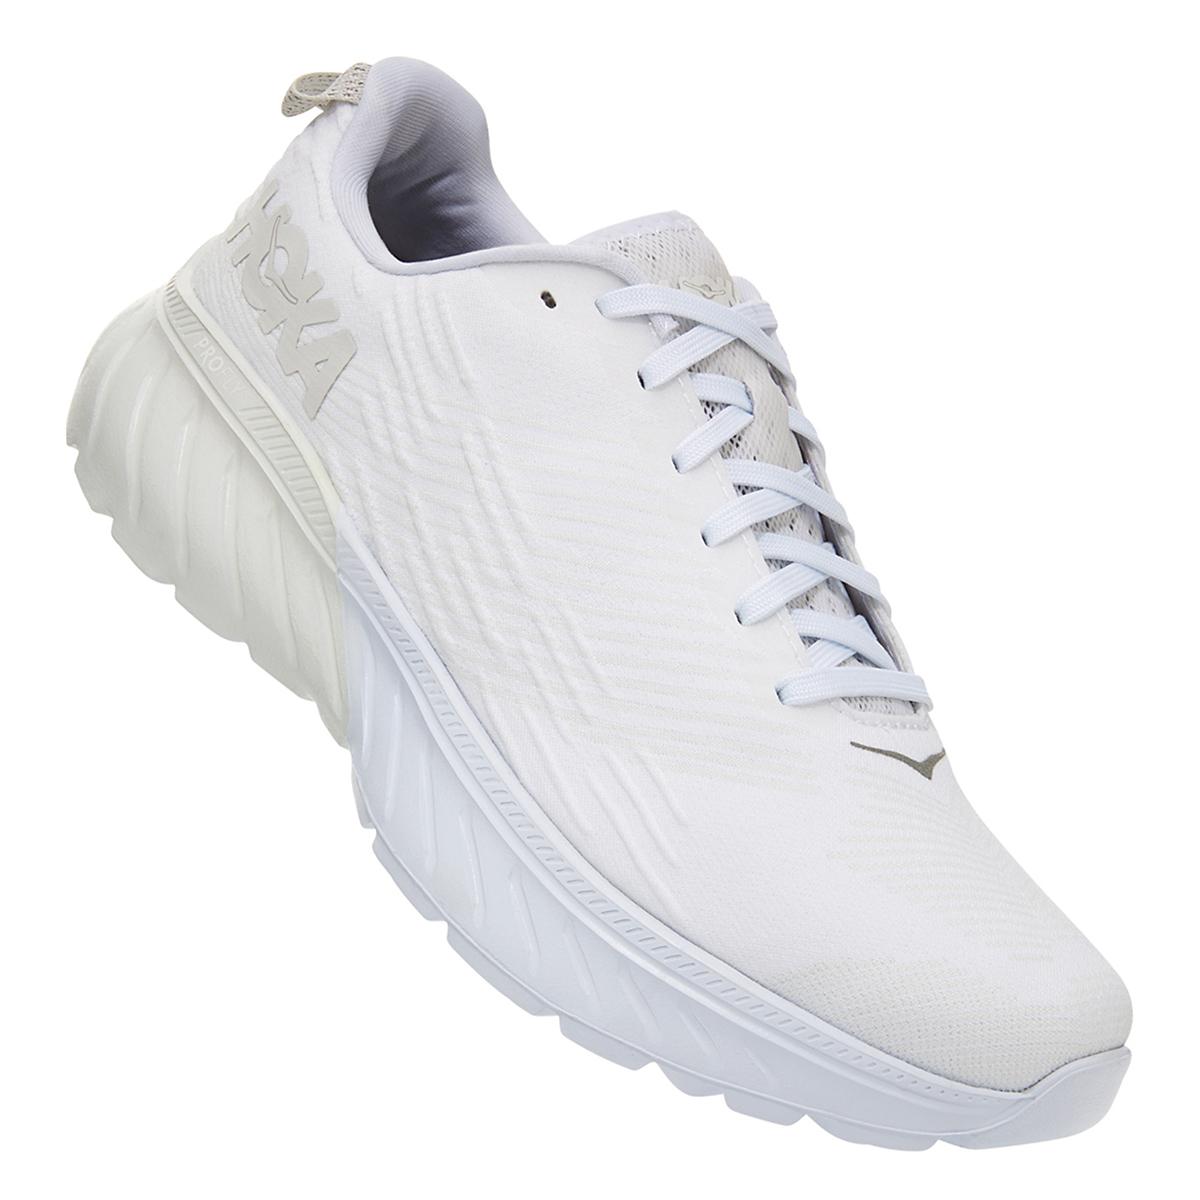 Women's Hoka One One Mach 3 Running Shoe - Color: White (Regular Width) - Size: 5, White, large, image 7